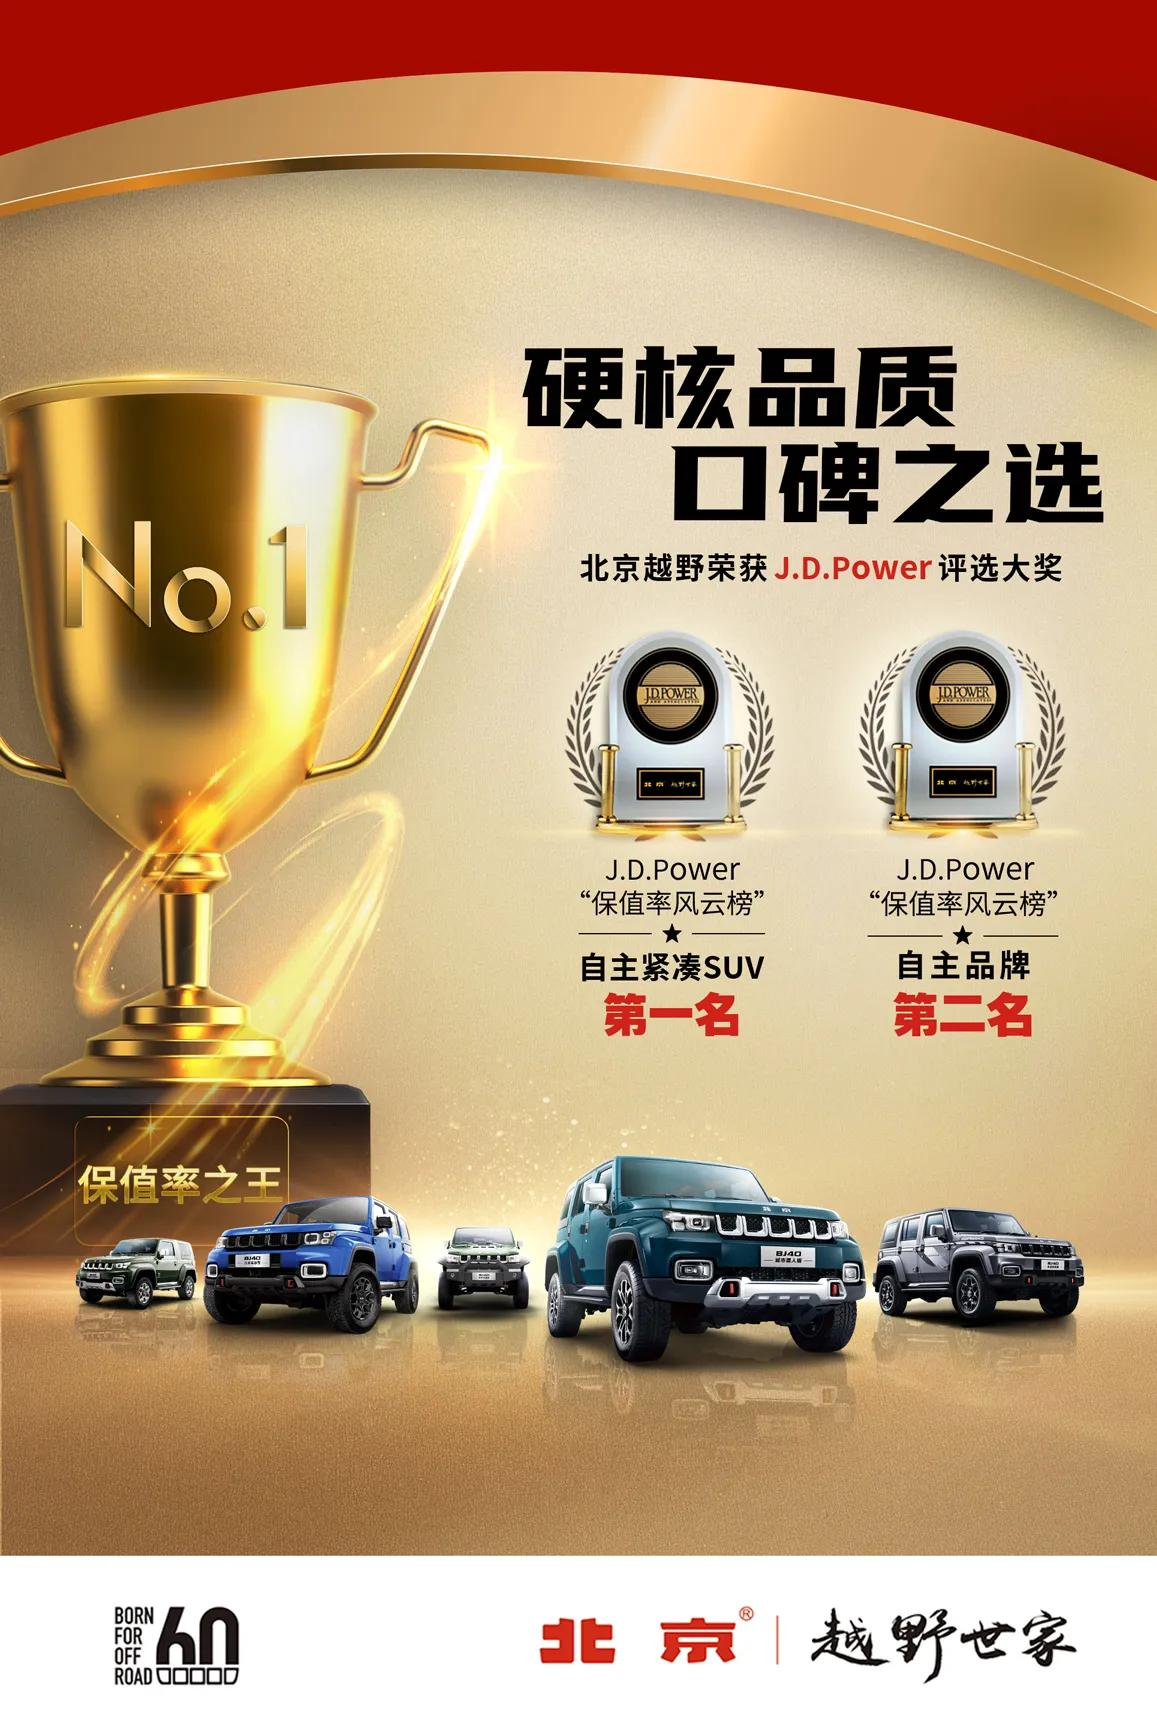 J.D. Power保值率丨BJ40夺冠自主紧凑SUV榜,用户看中了什么?